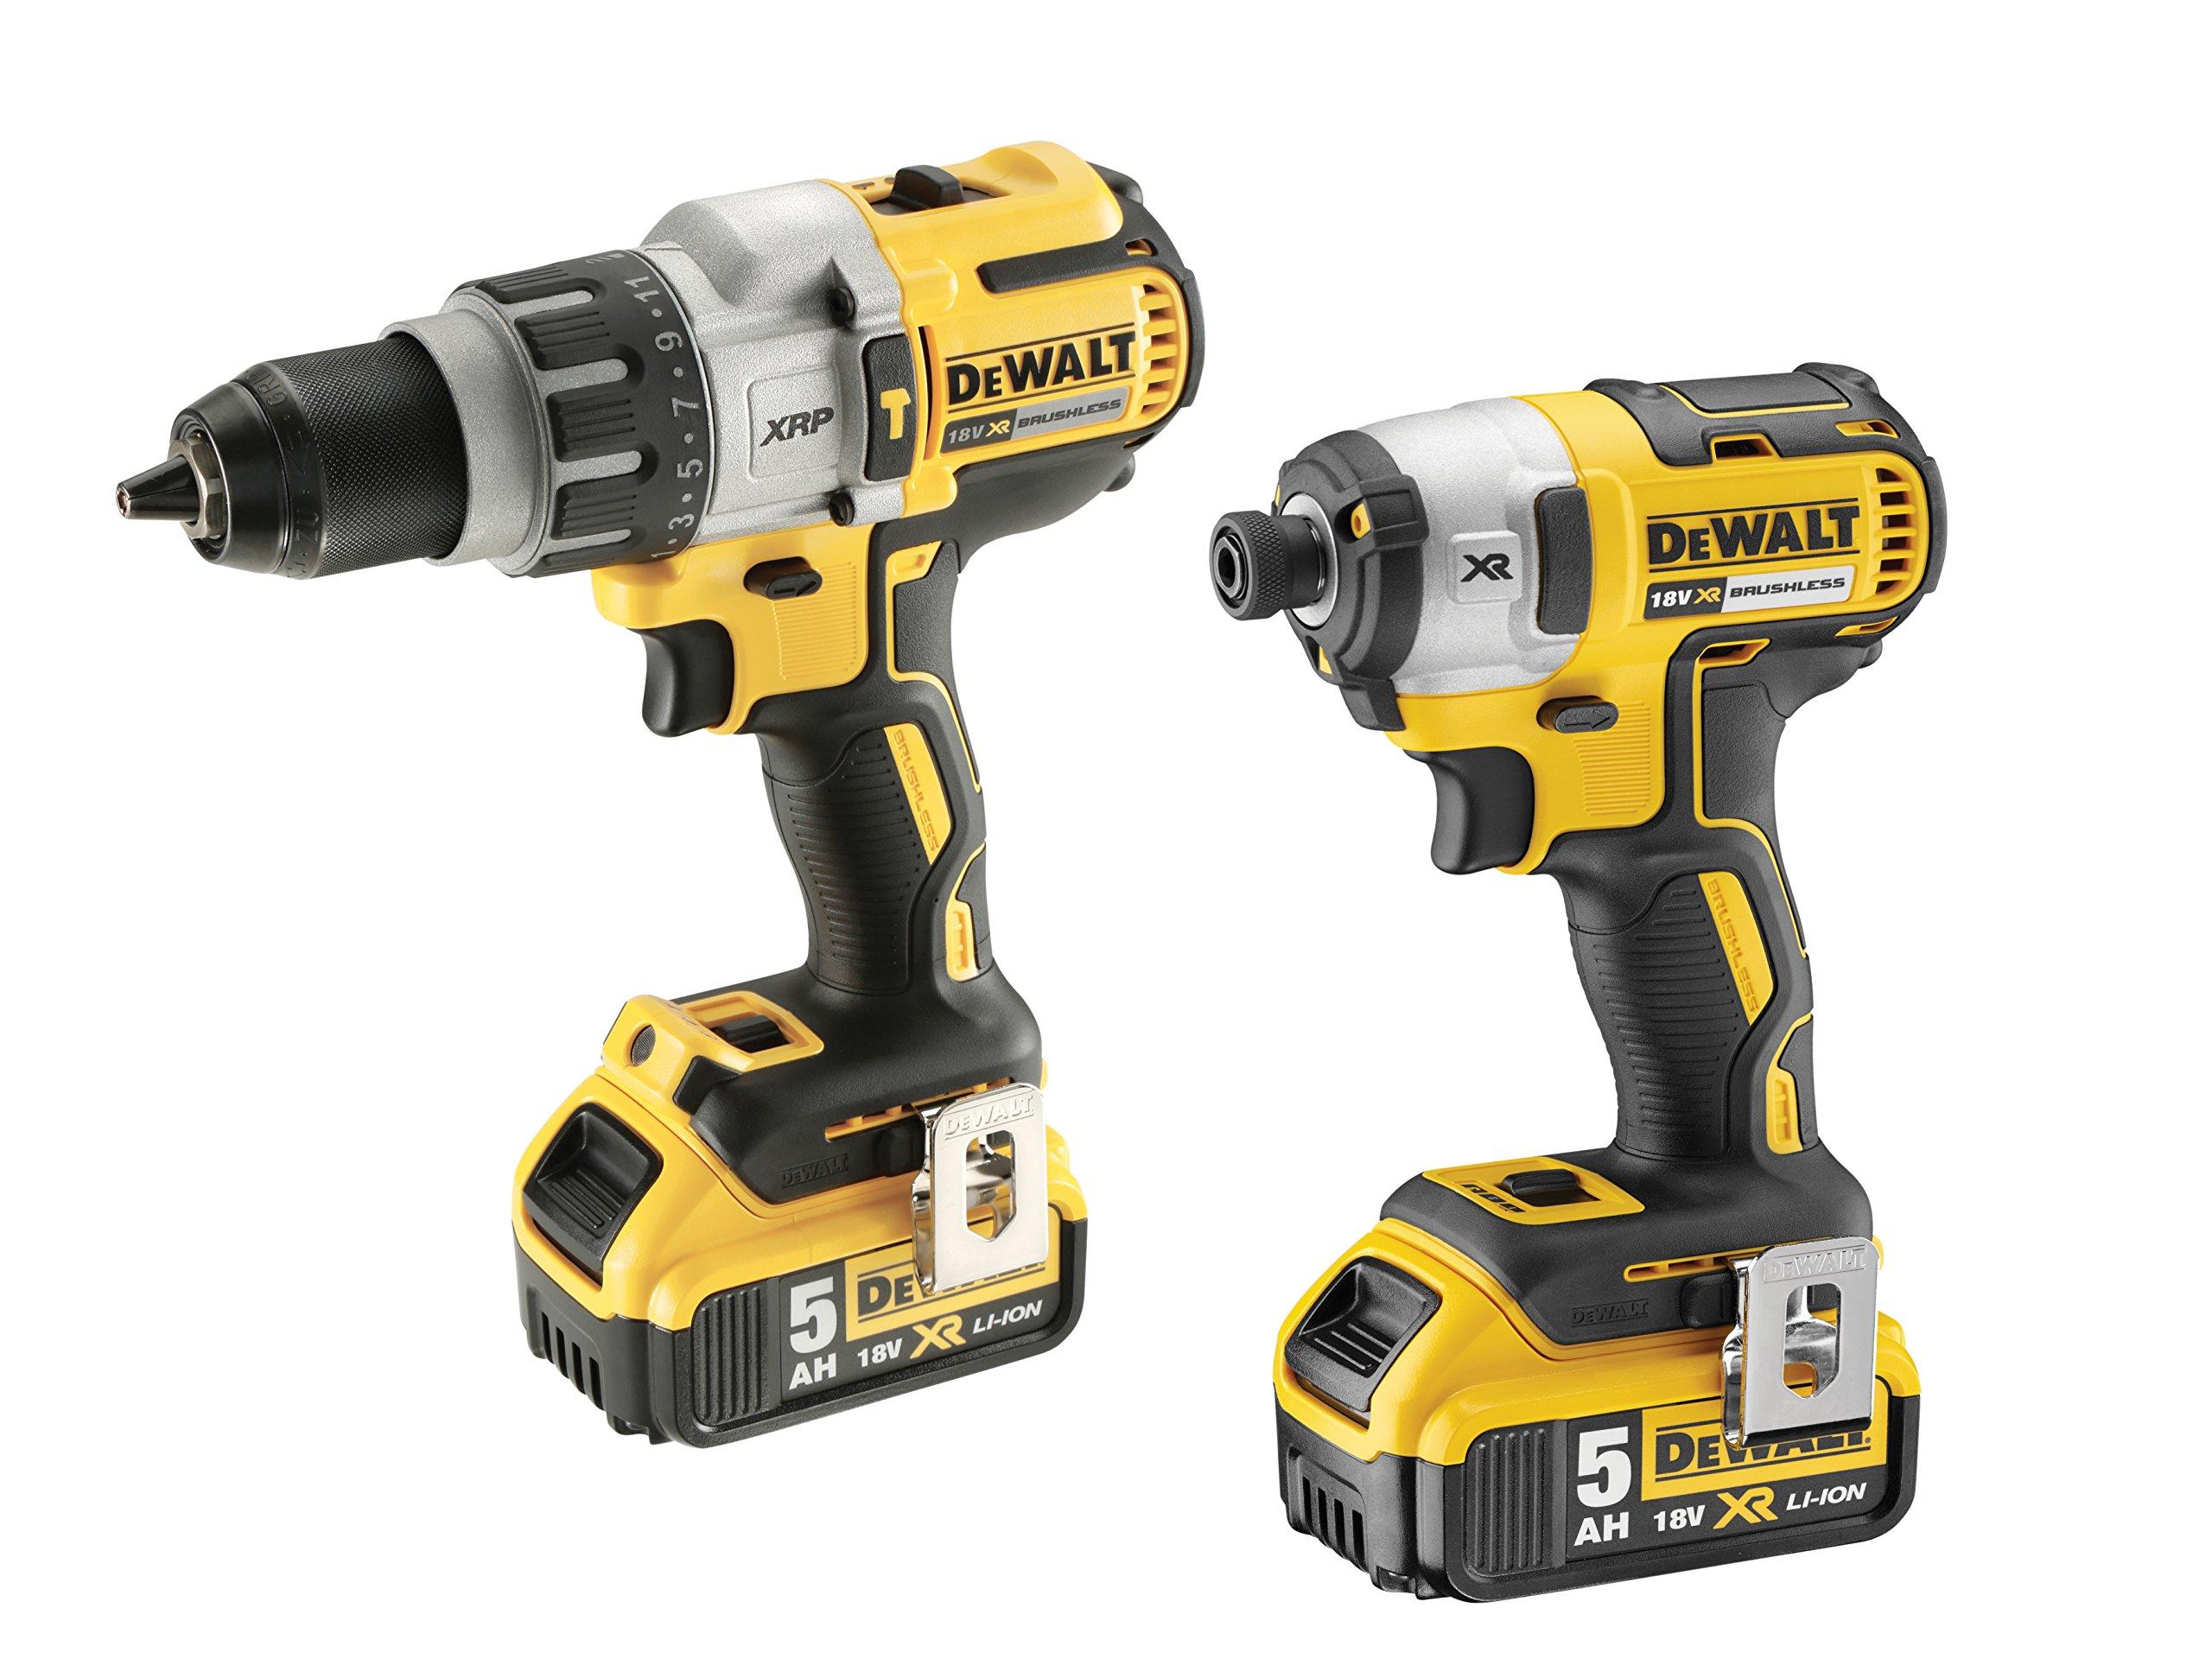 Dewalt DCK276P2-GB Combi Drill and Impact Driver XR 18V Brushless Kit (2 x 5.0Ah Batteries) in Toughsystem Box, 18 V, Yellow/Black, 57 x 35 x 17 cm